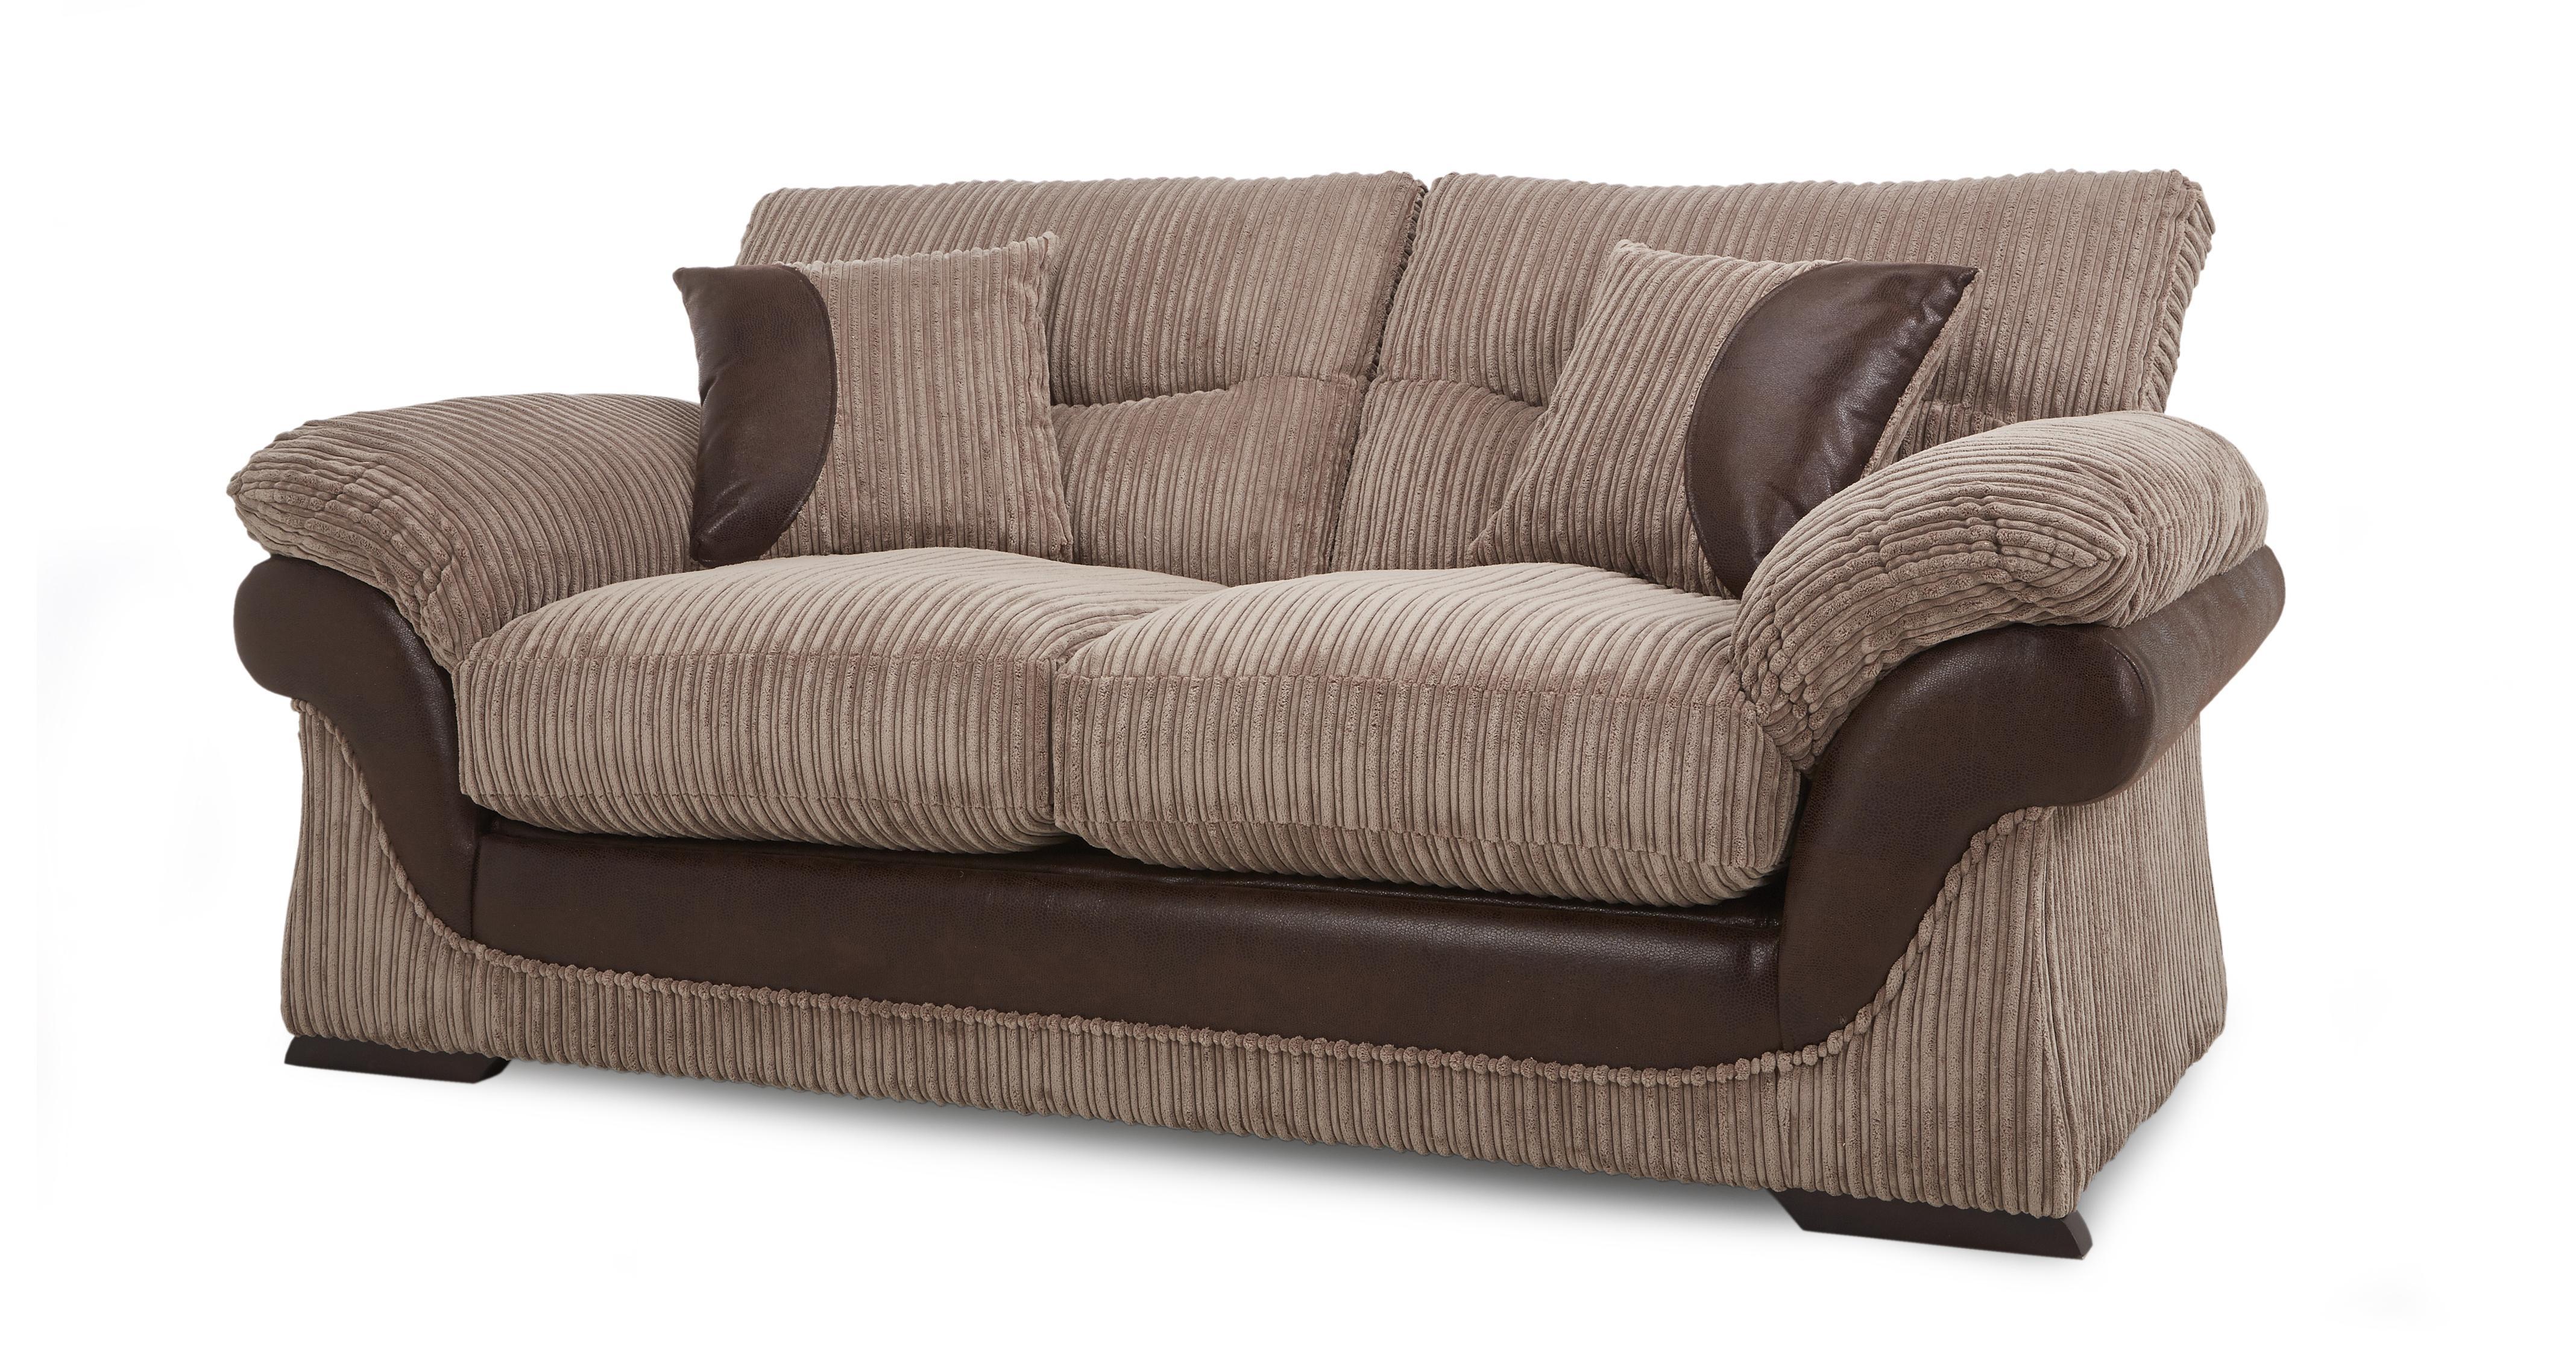 Dfs Landon Nutmeg Fabric Large 2 Seater Sofa Bed Ebay